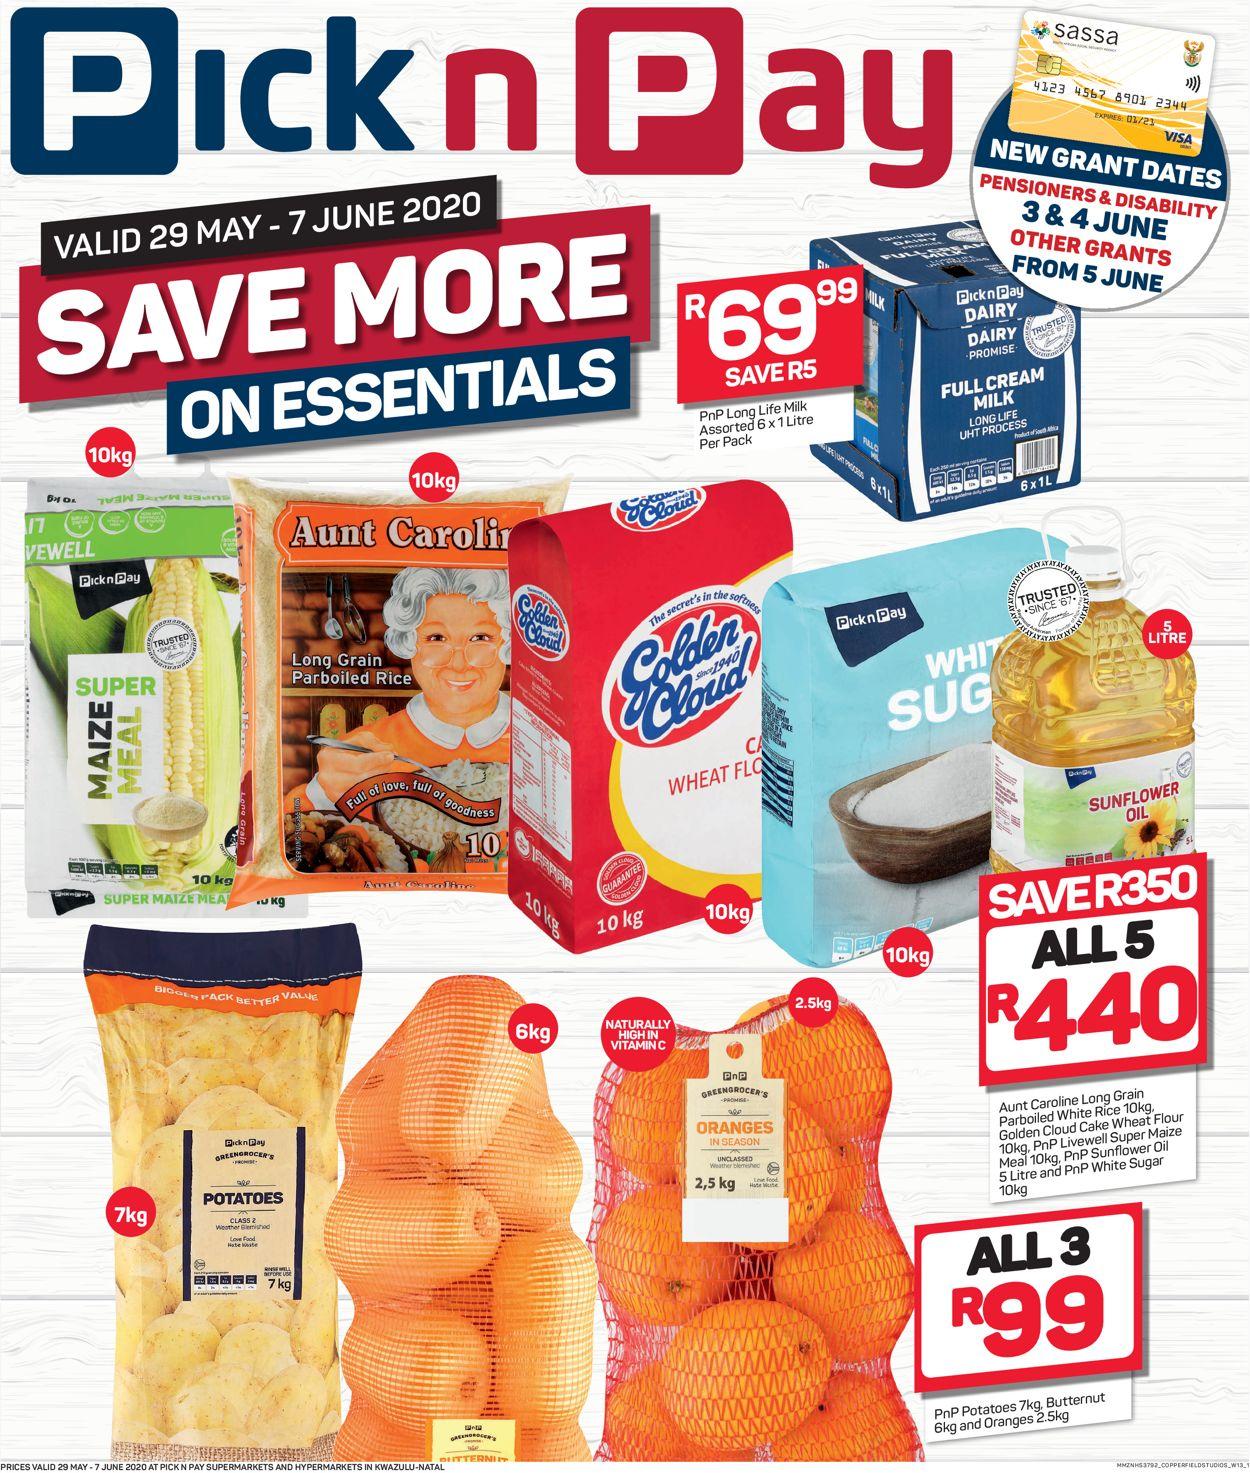 Pick n Pay Catalogue - 2020/05/29-2020/06/07